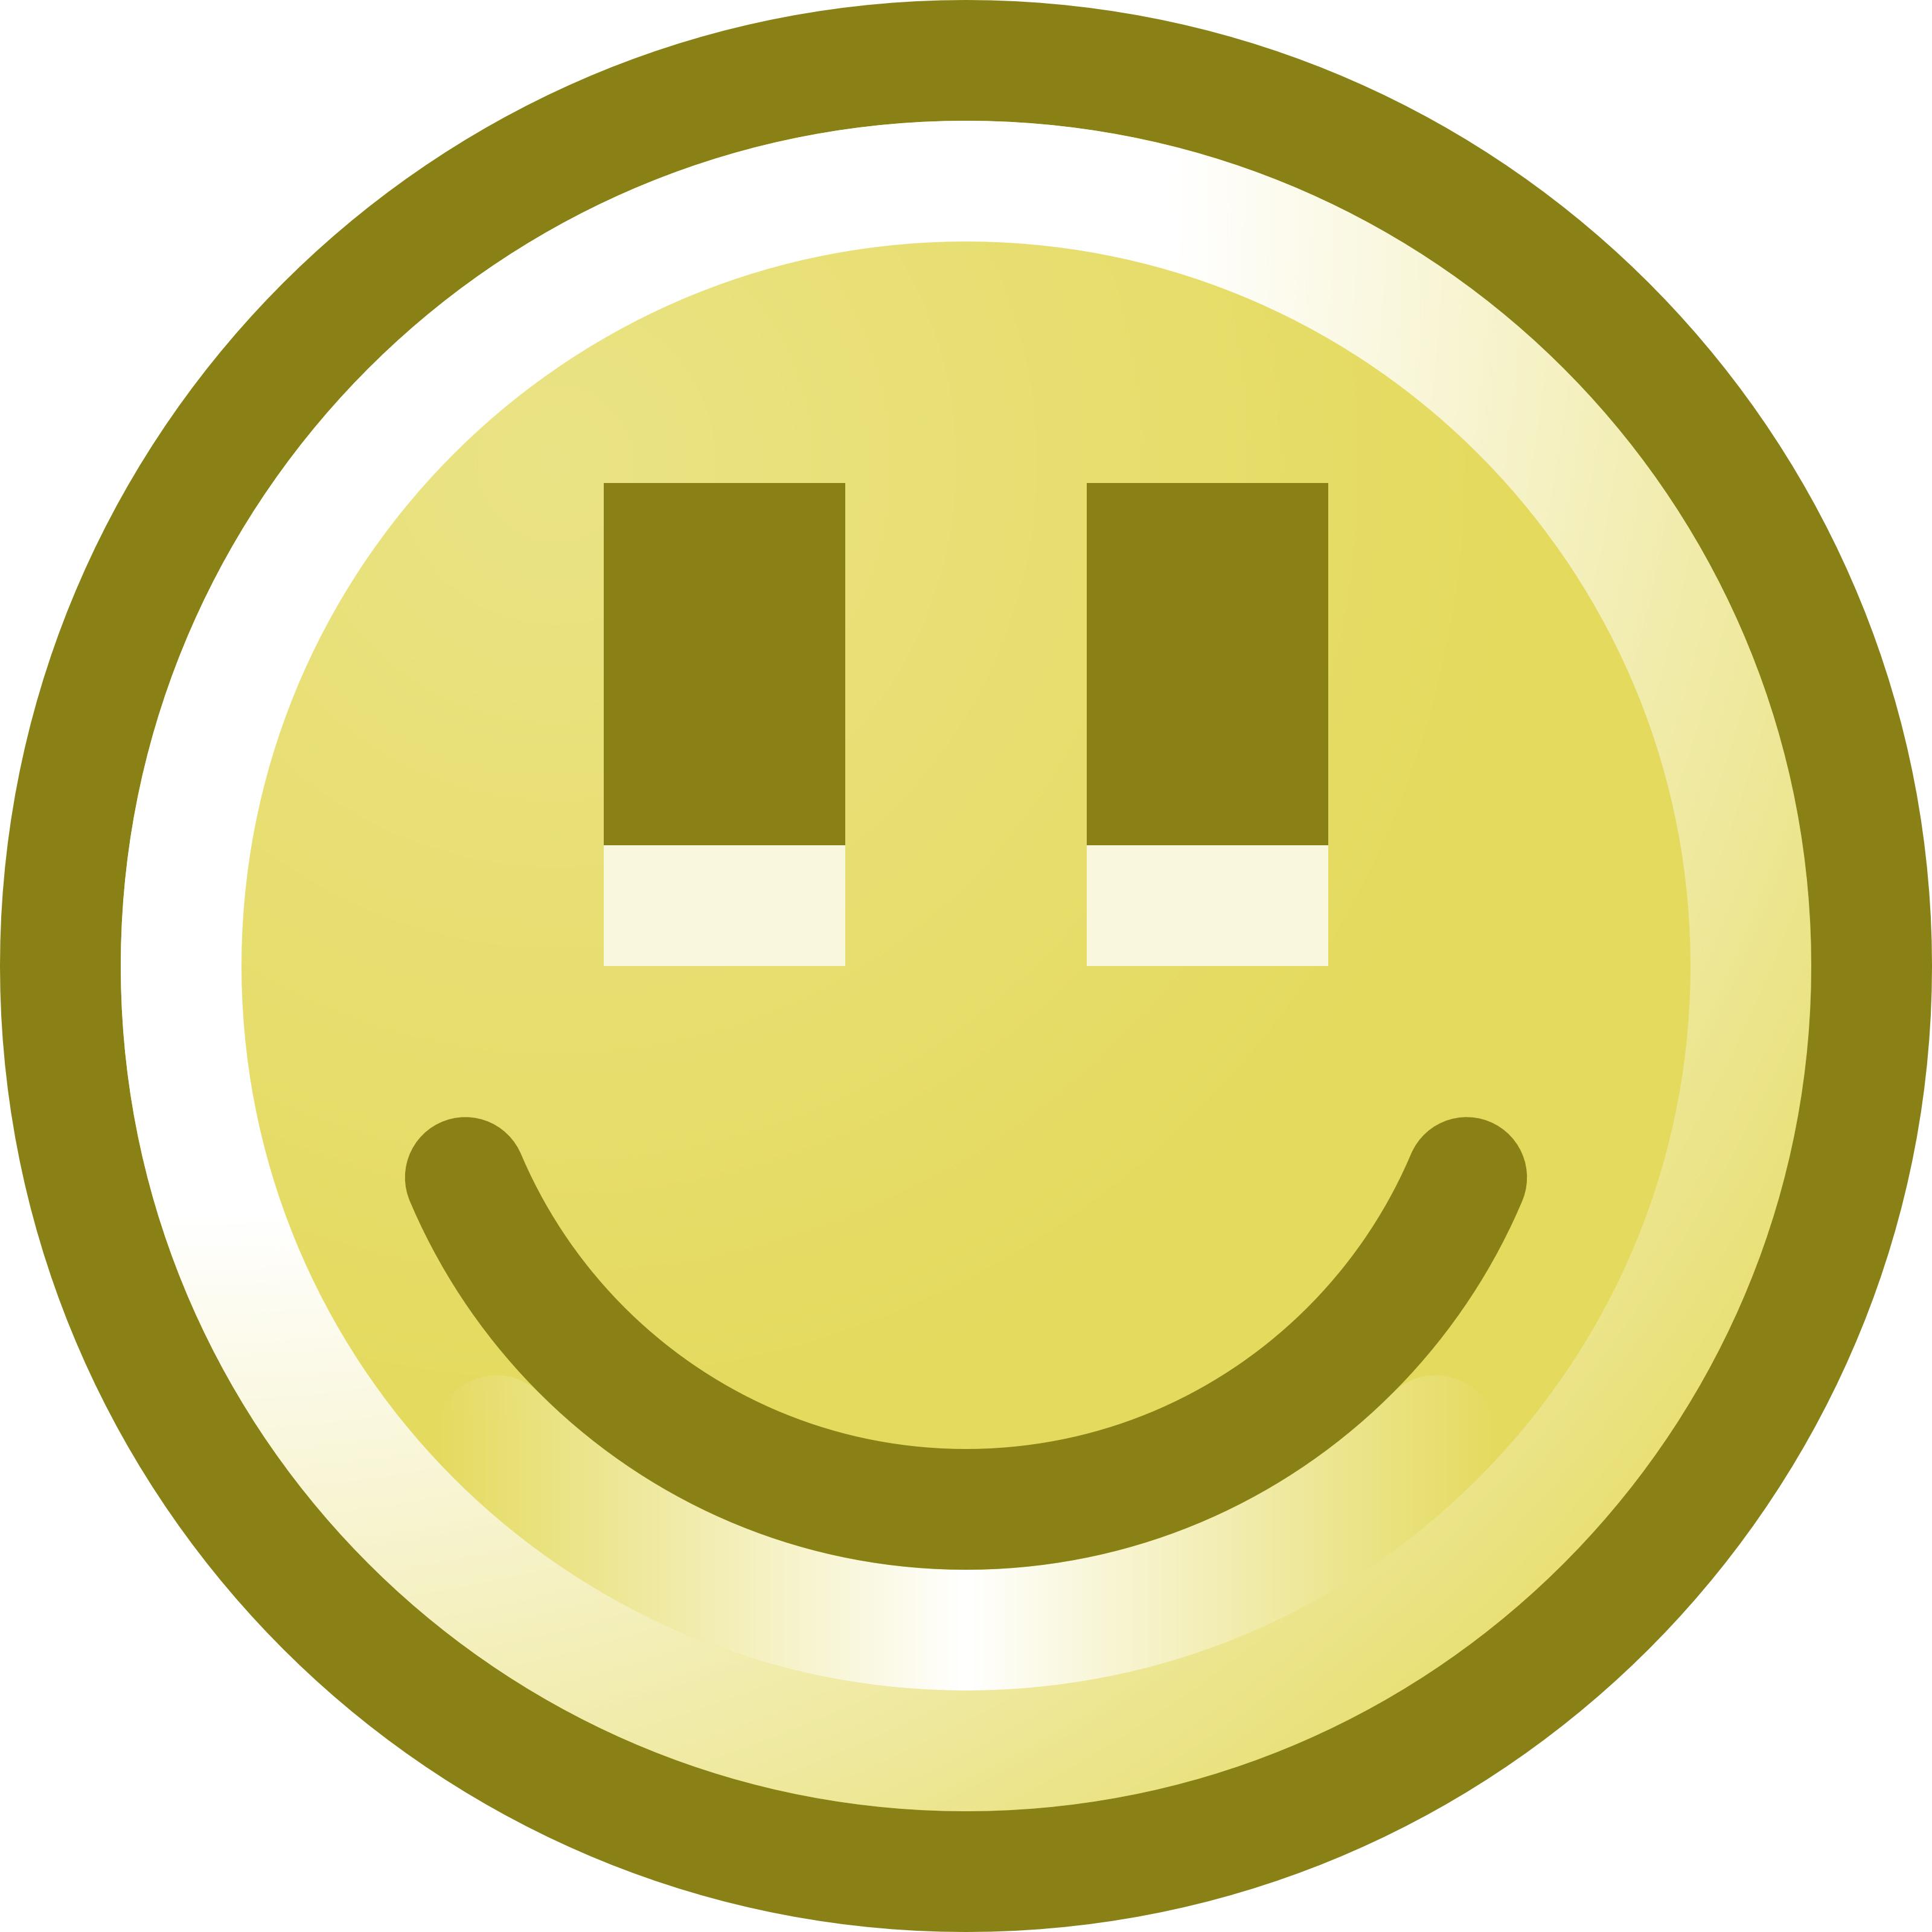 3200x3200 Smiling Smiley Face Clip Art Illustration